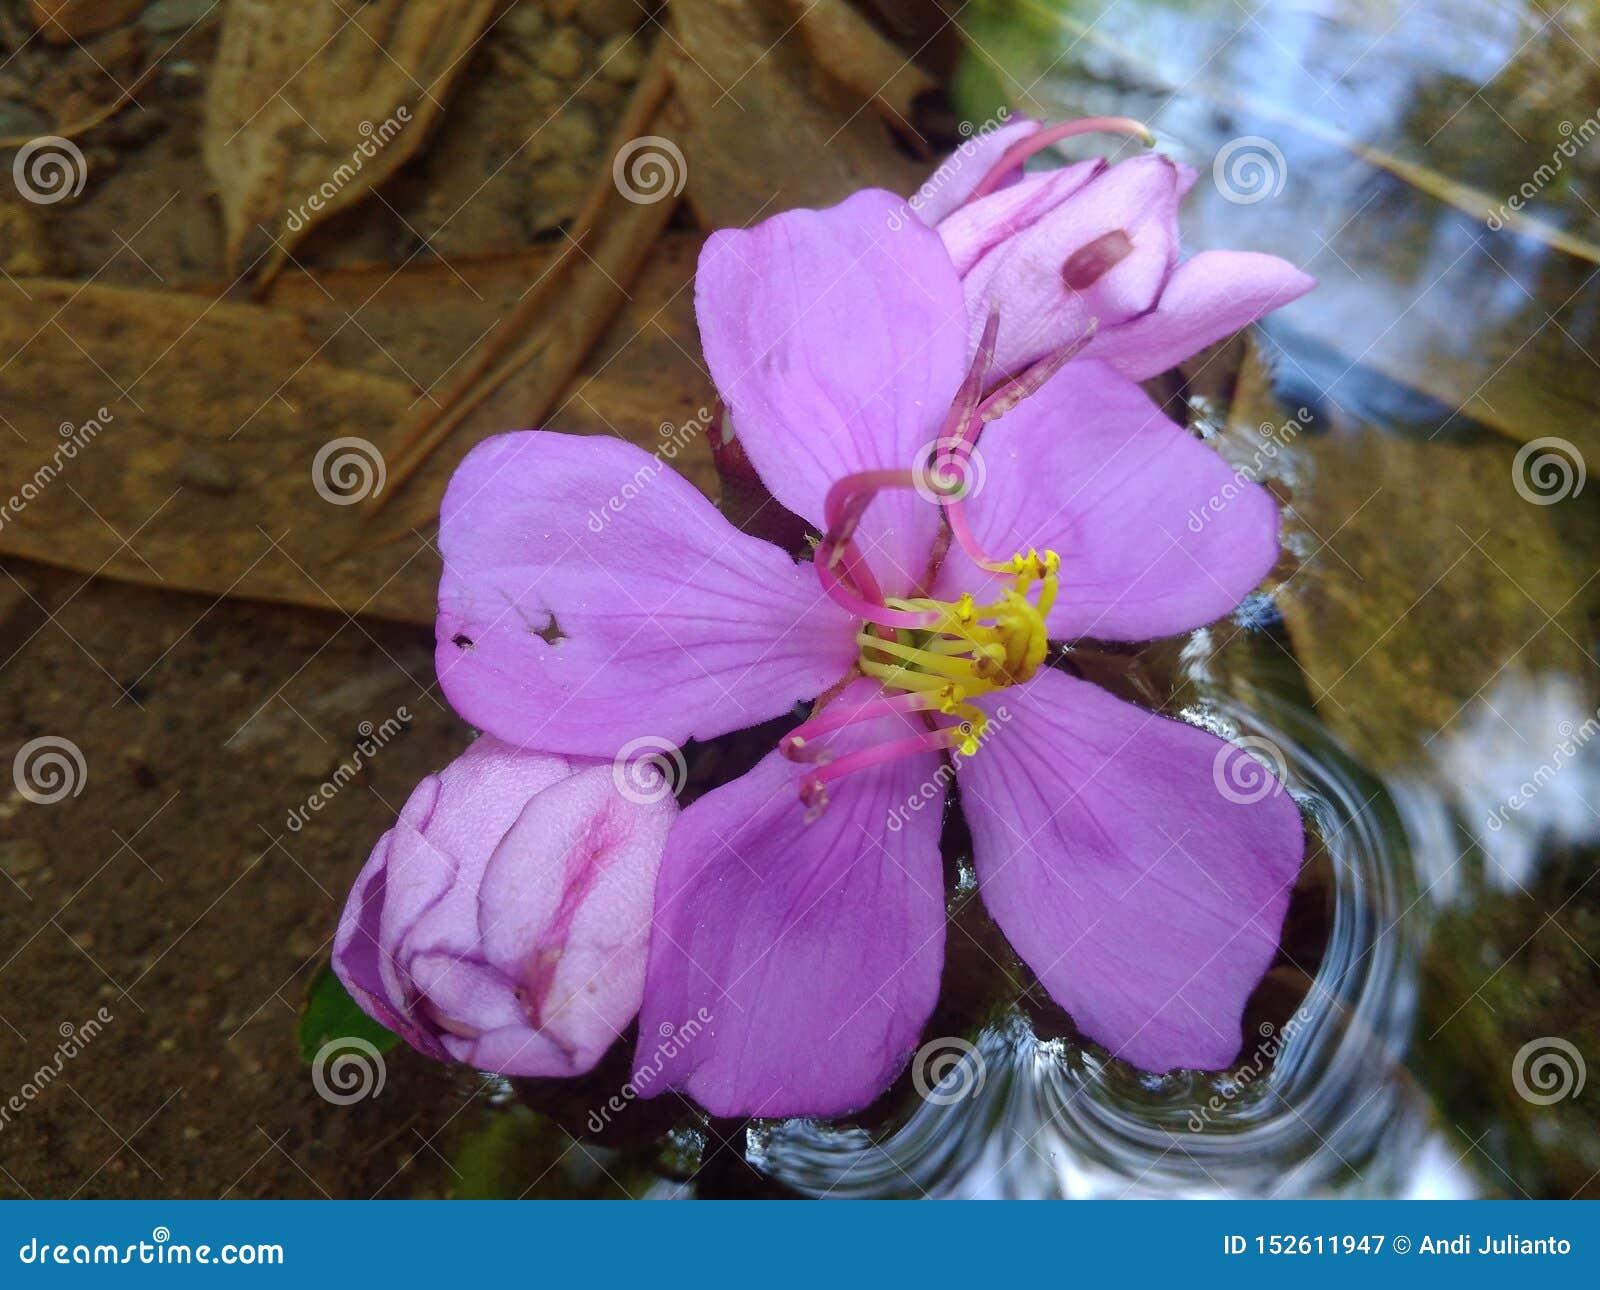 Trevlig blomma i vattnet